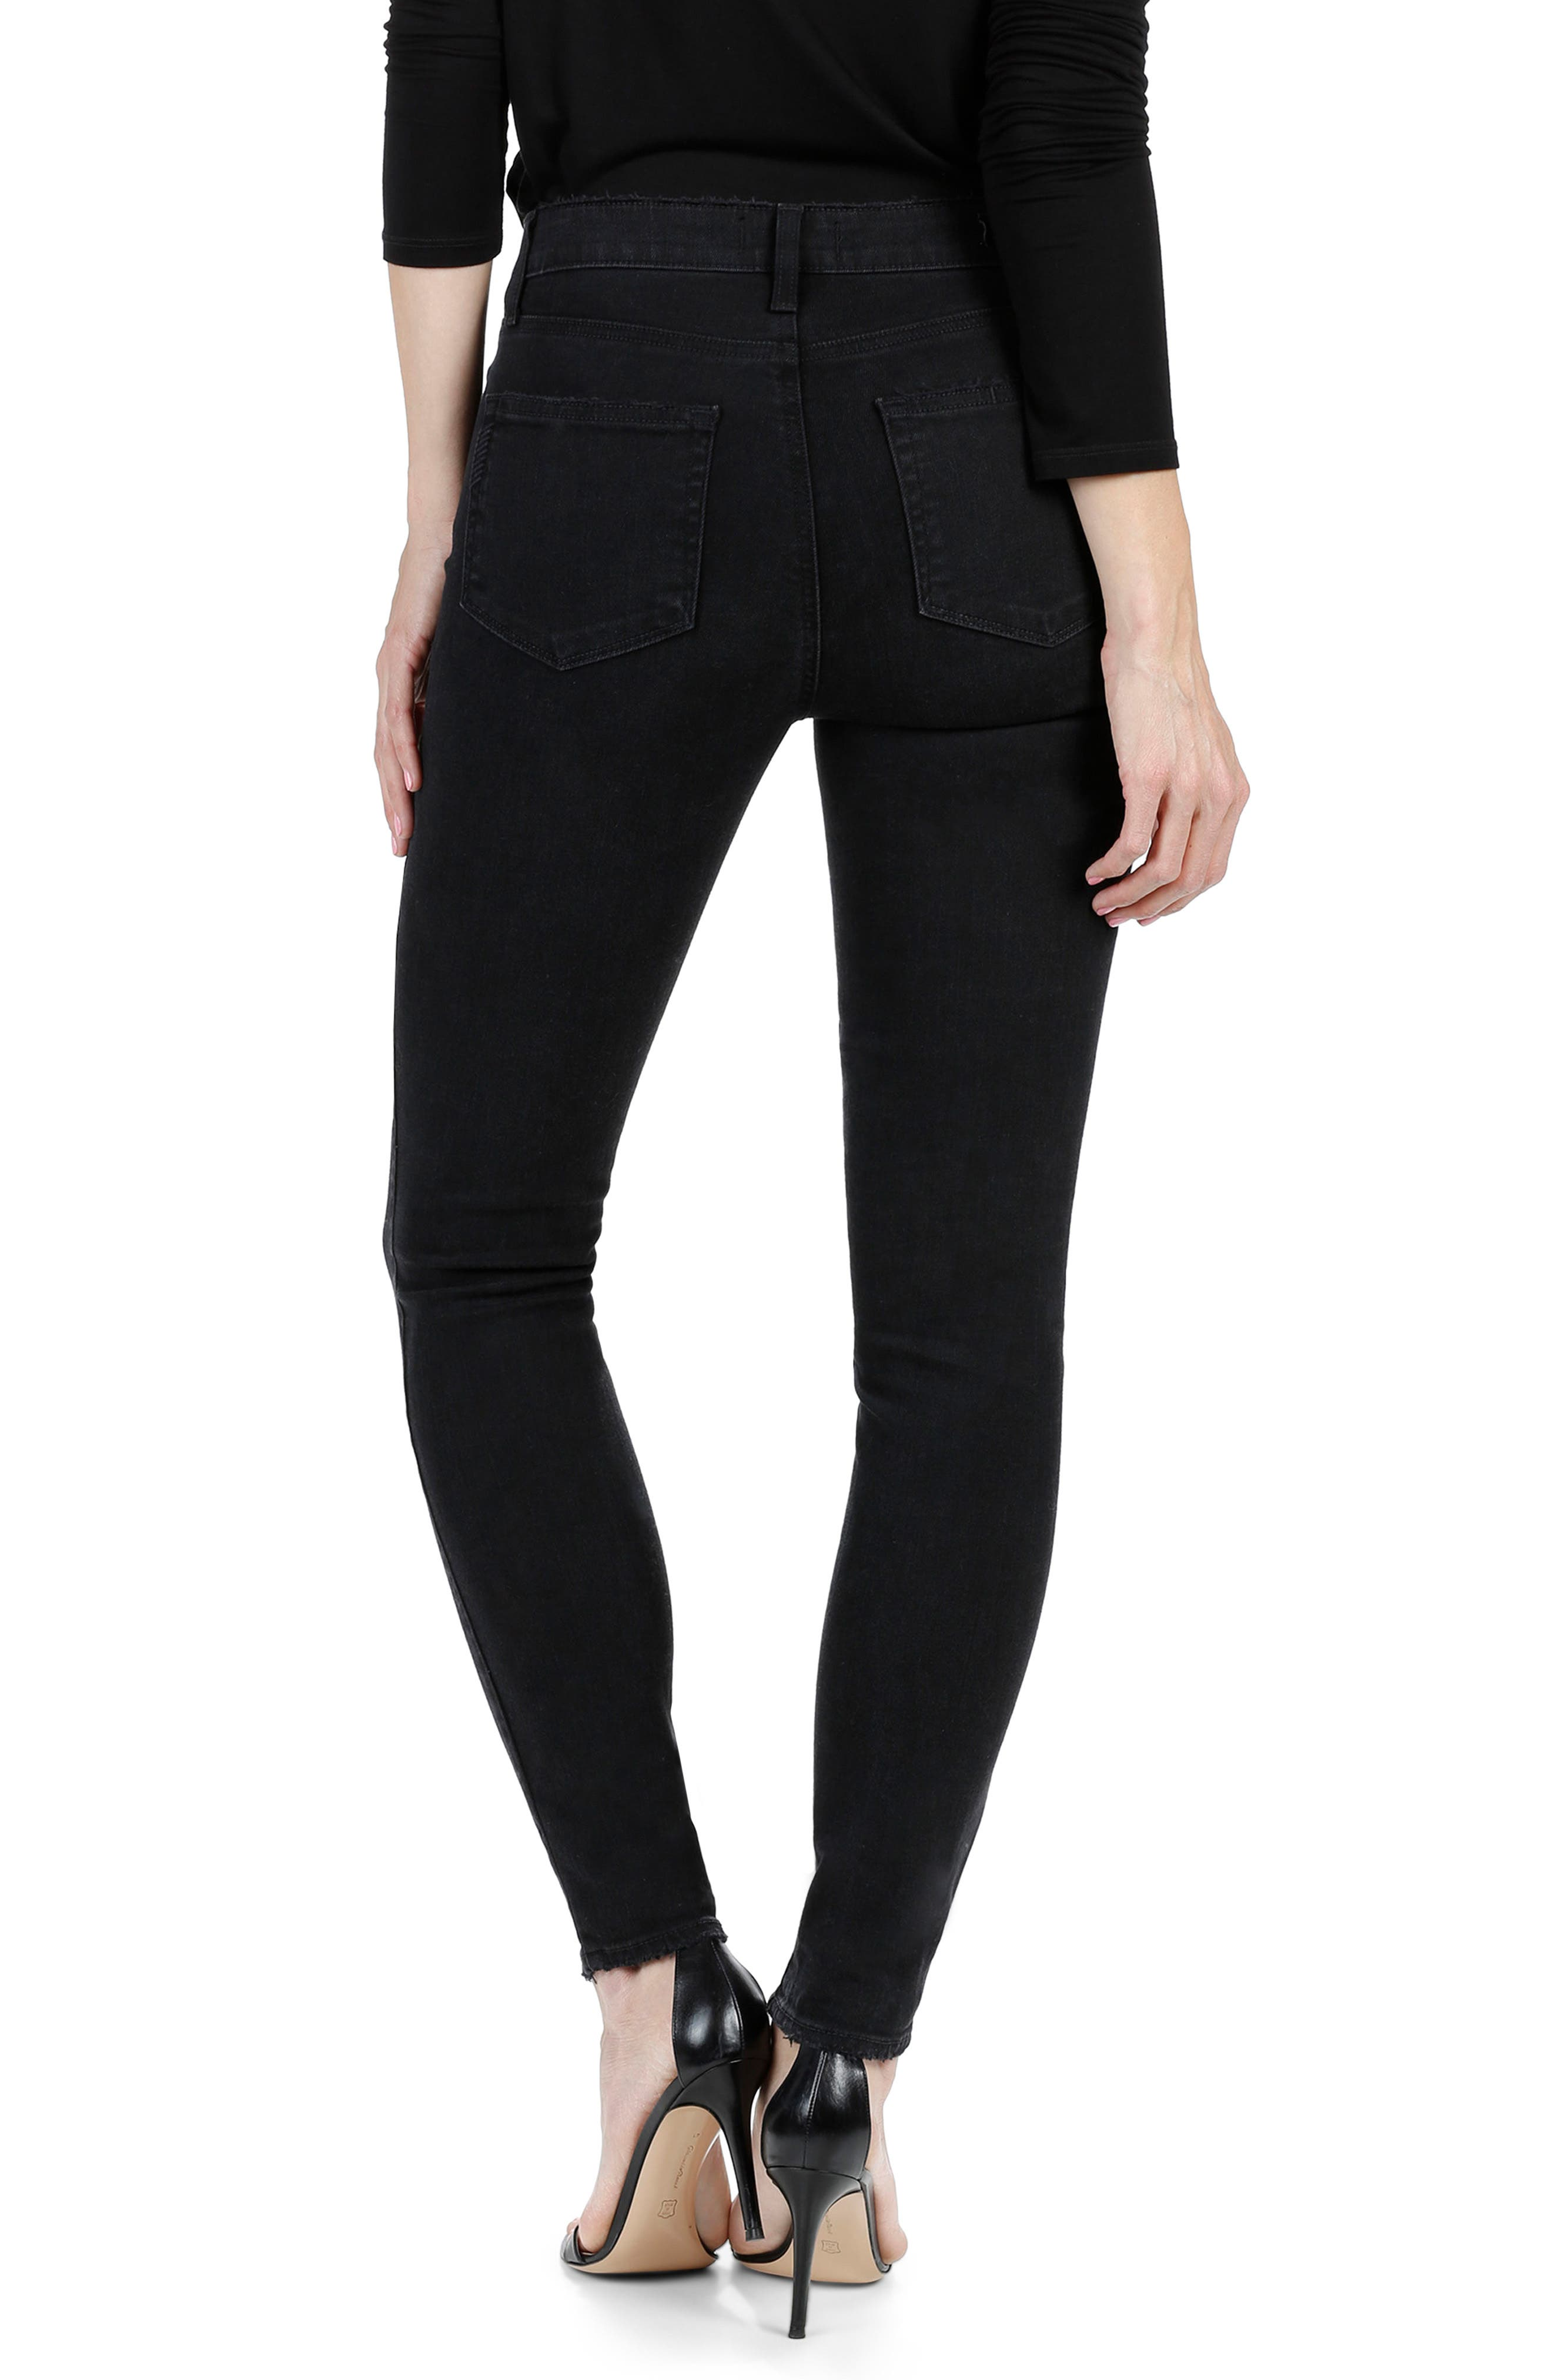 Hoxton High Waist Ultra Skinny Jeans,                             Alternate thumbnail 3, color,                             001